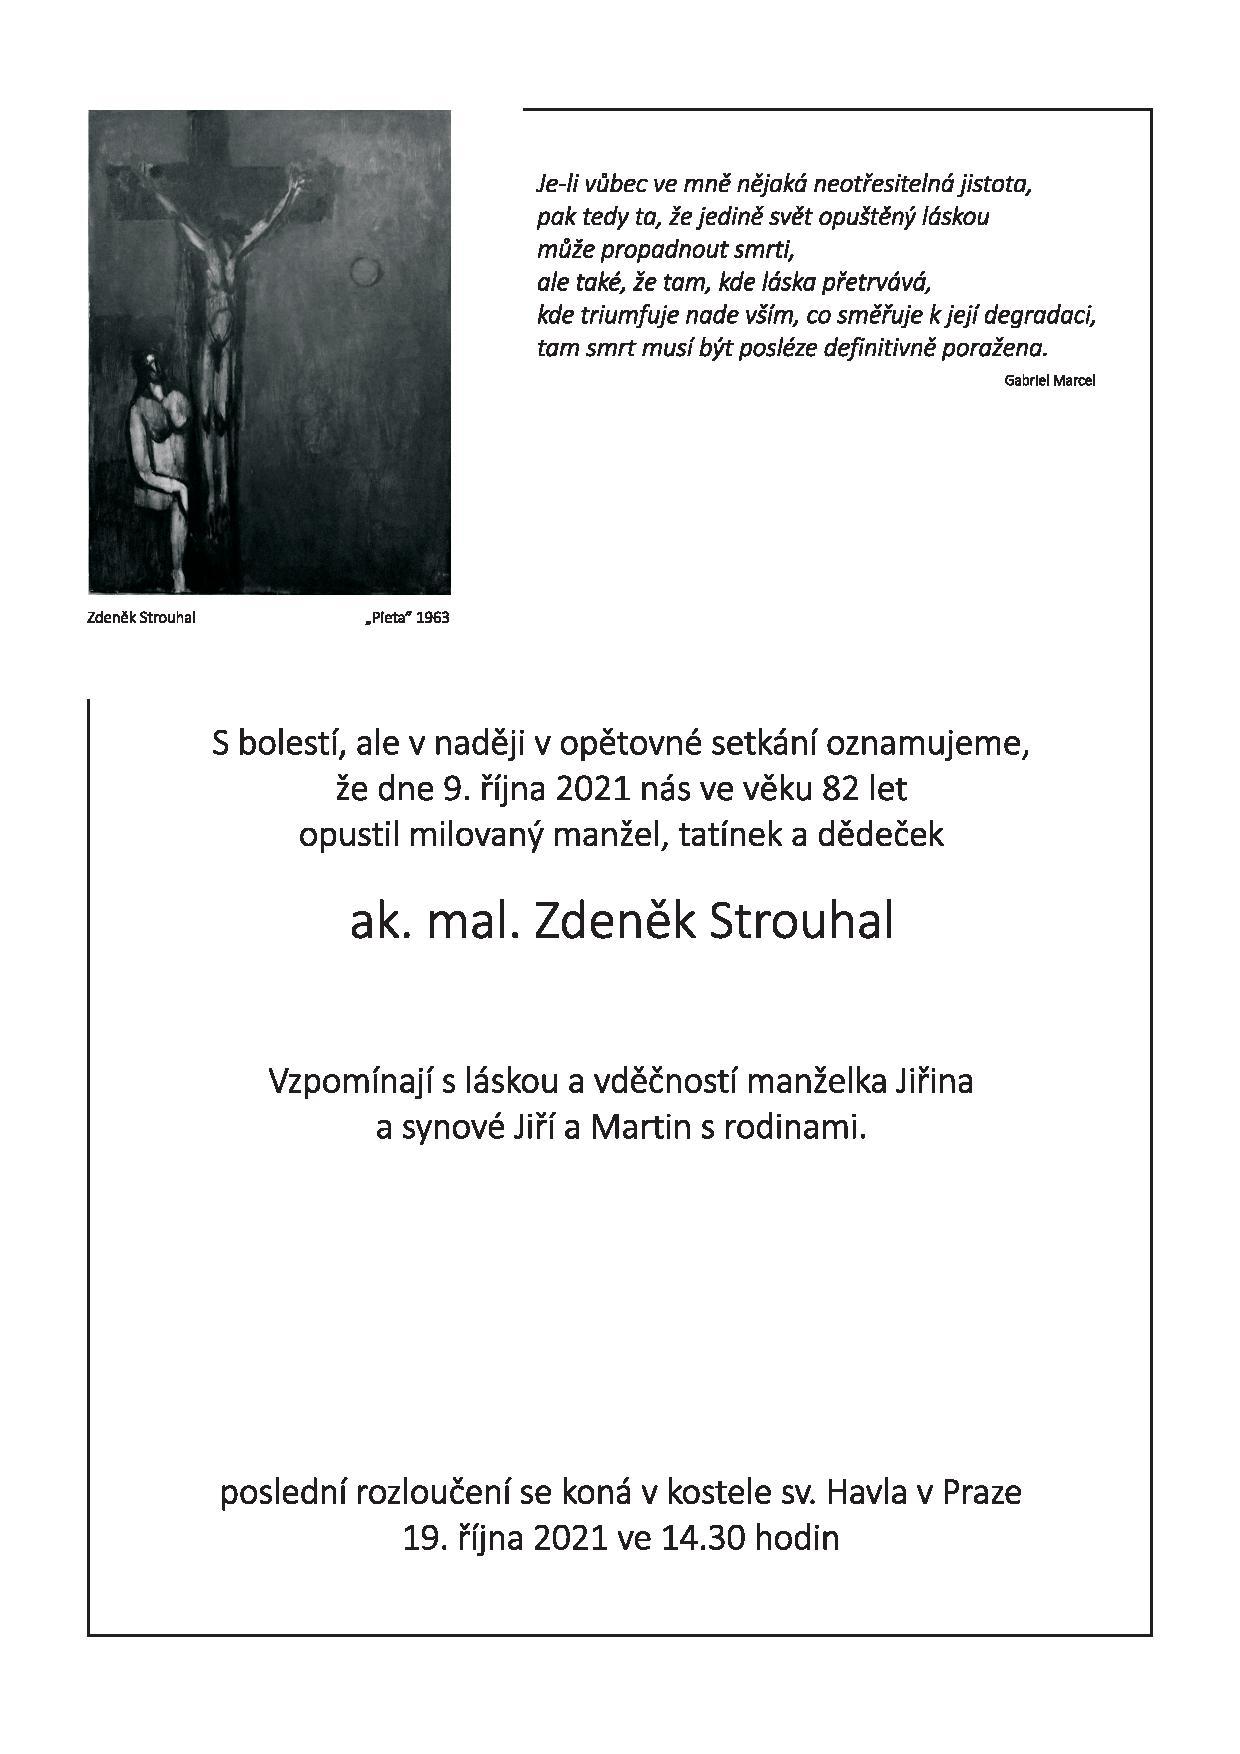 2021 zdenek_strouhal_smutoznamani-page-001